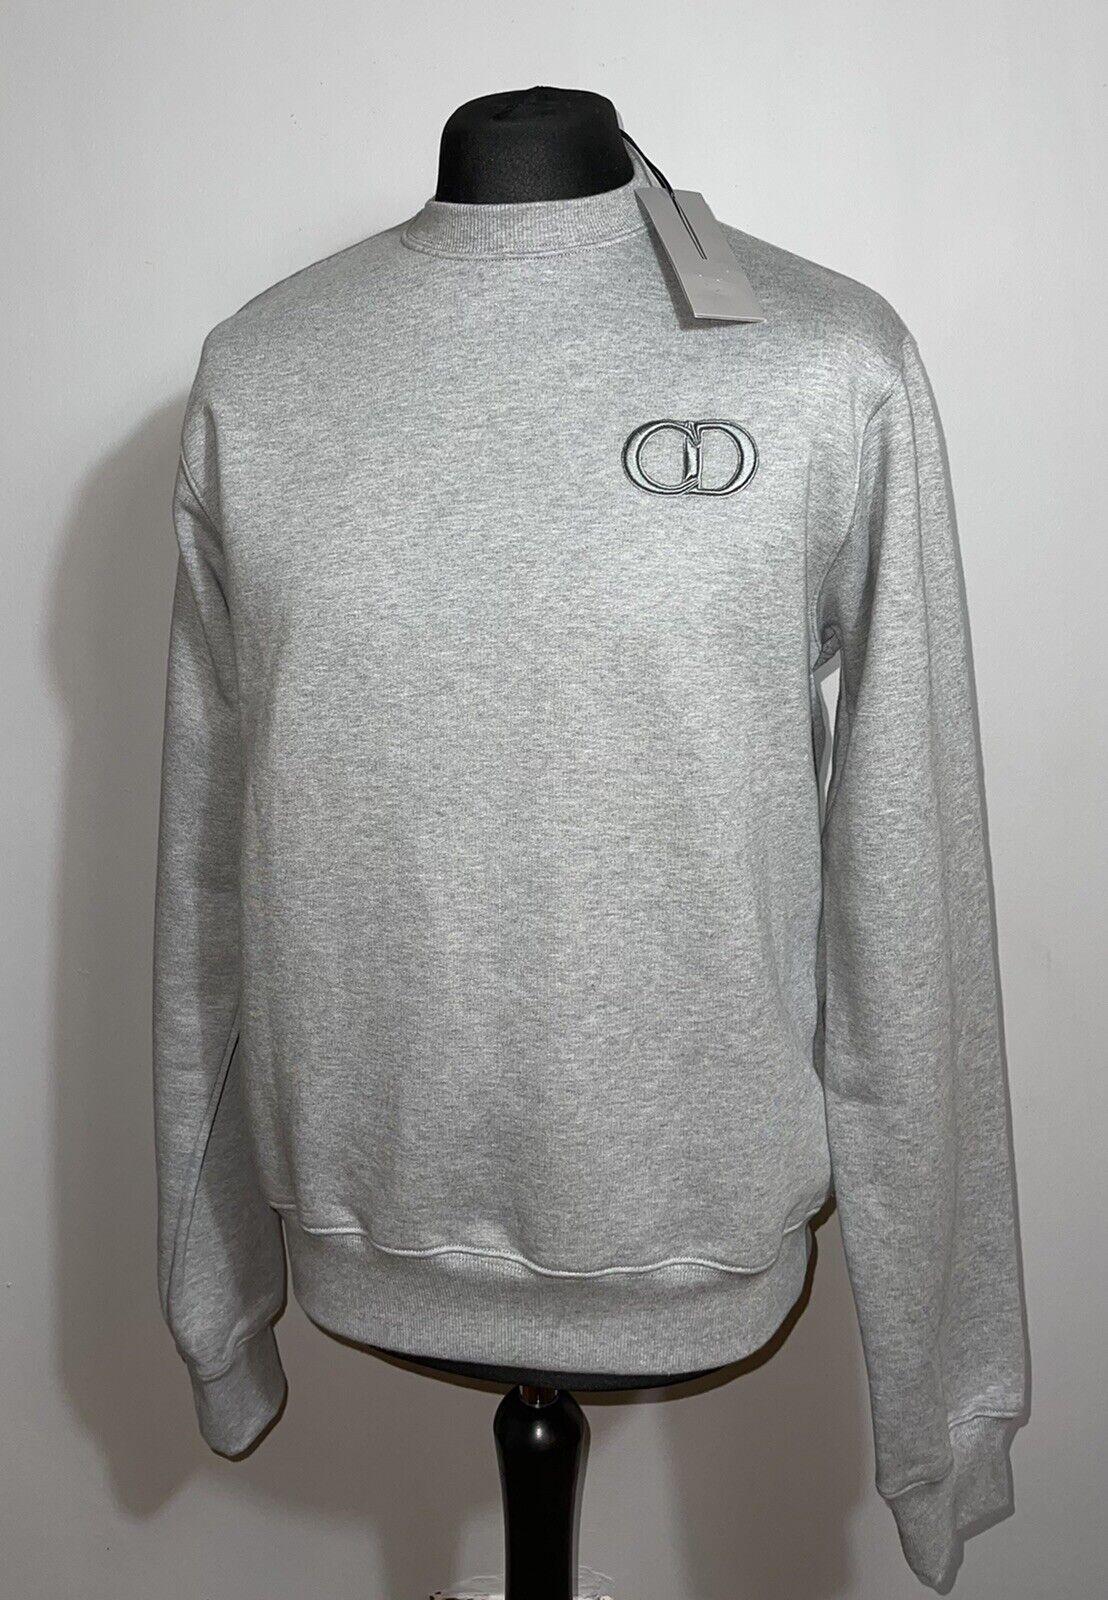 Dior CD Icon Grey Cotton Fleece Sweatshirt BNWT Large Mens Tee RRP L Gray